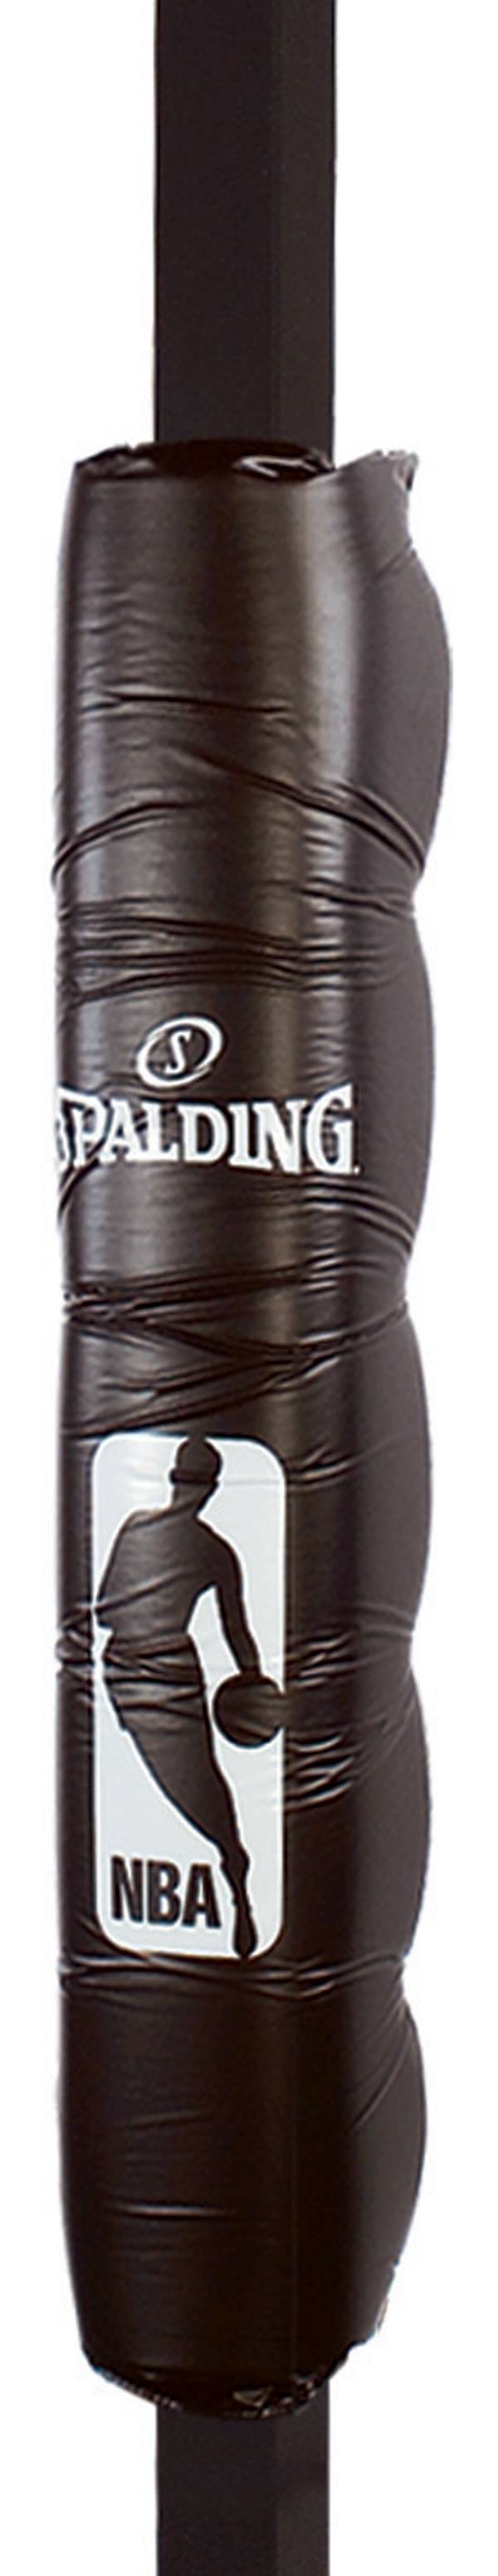 Spalding Heavy Duty Pole Pad product image